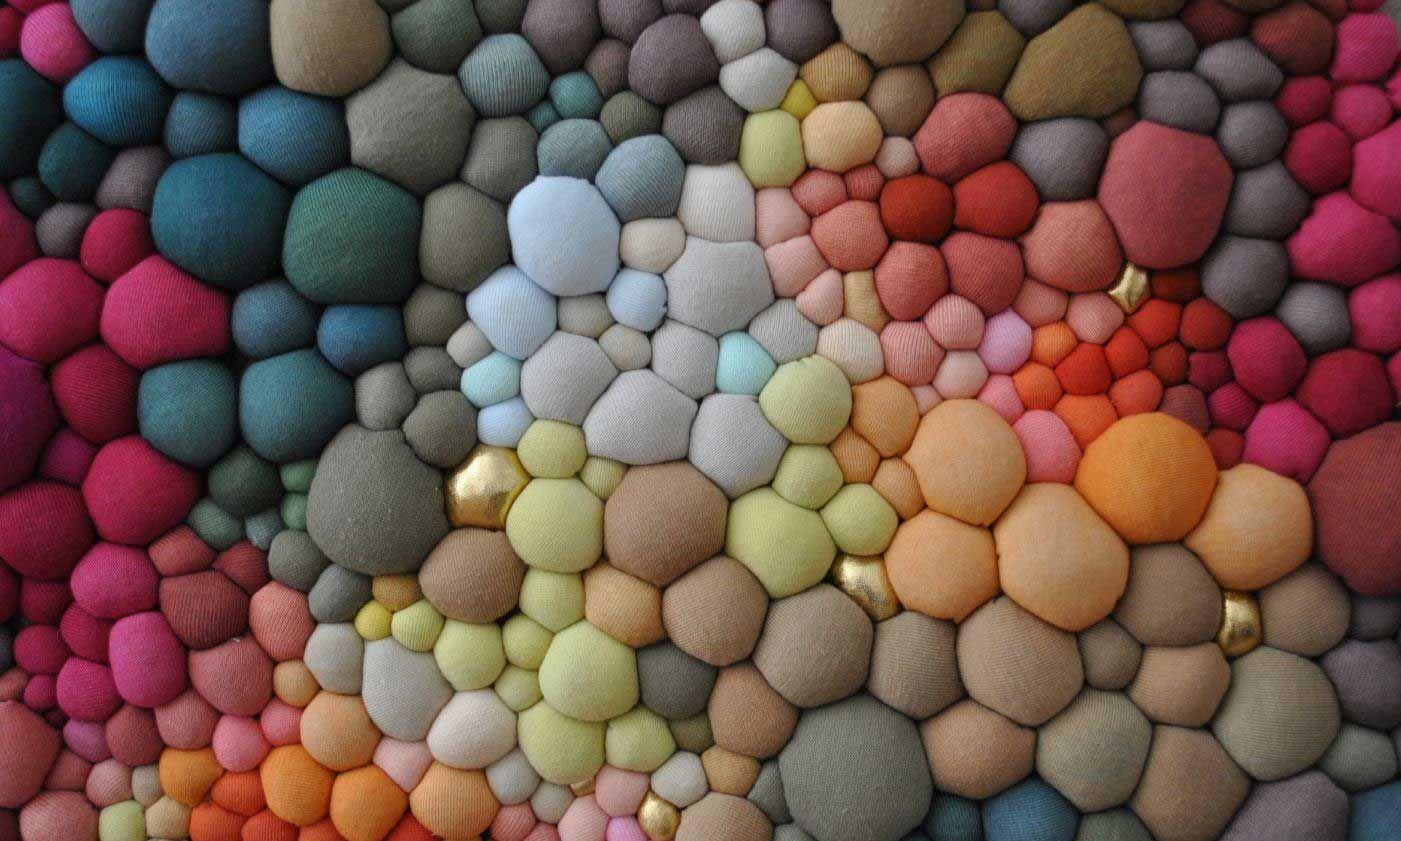 Textil hogar c mo elegir las telas para decorar textil - Decoracion textil hogar ...